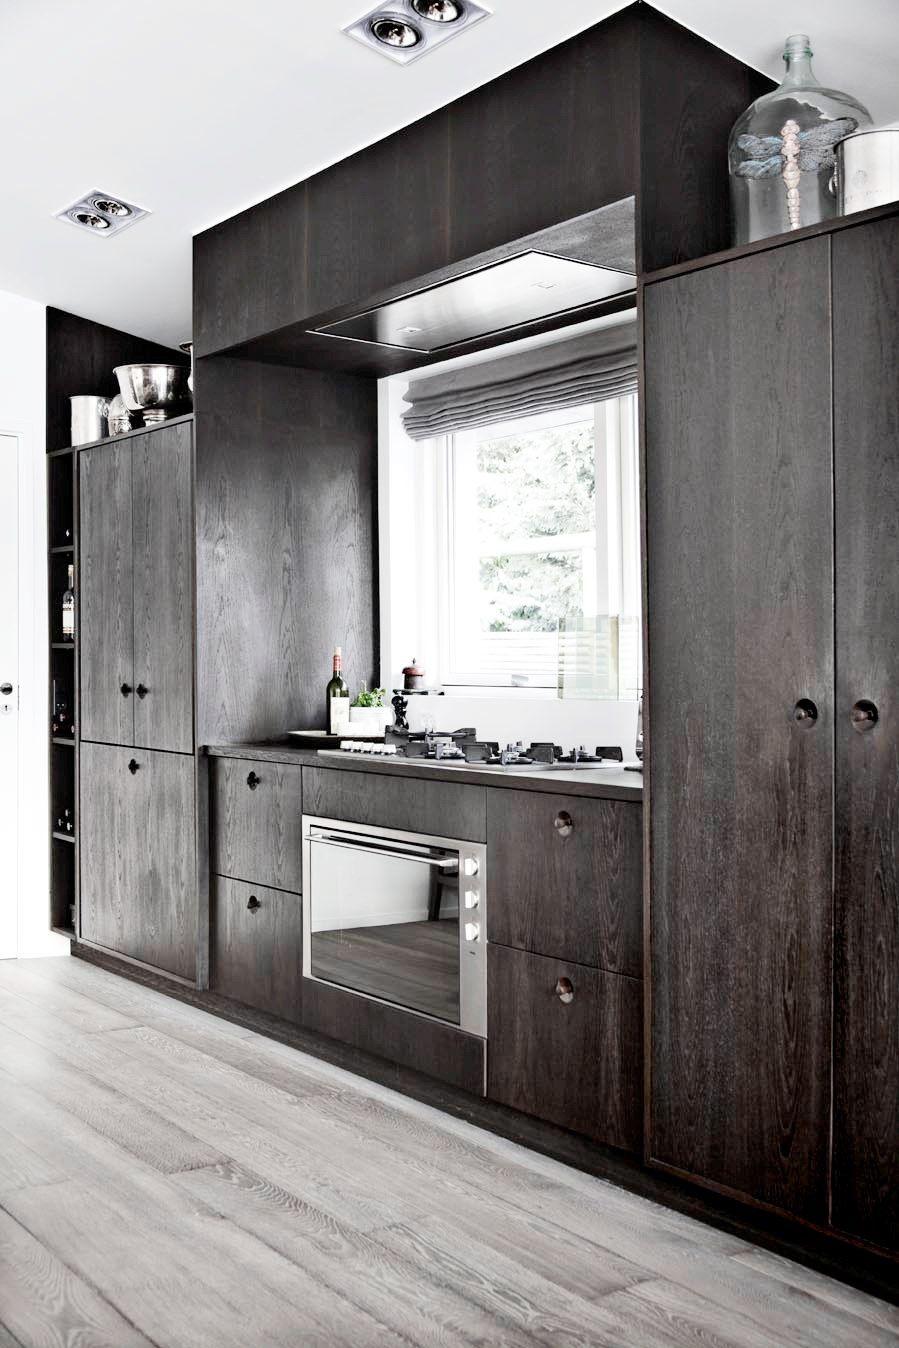 Modern Rustic Kitchen Smokey Cabinets Kitchen Inspiration Design Modern Wood Kitchen Unfinished Kitchen Cabinets